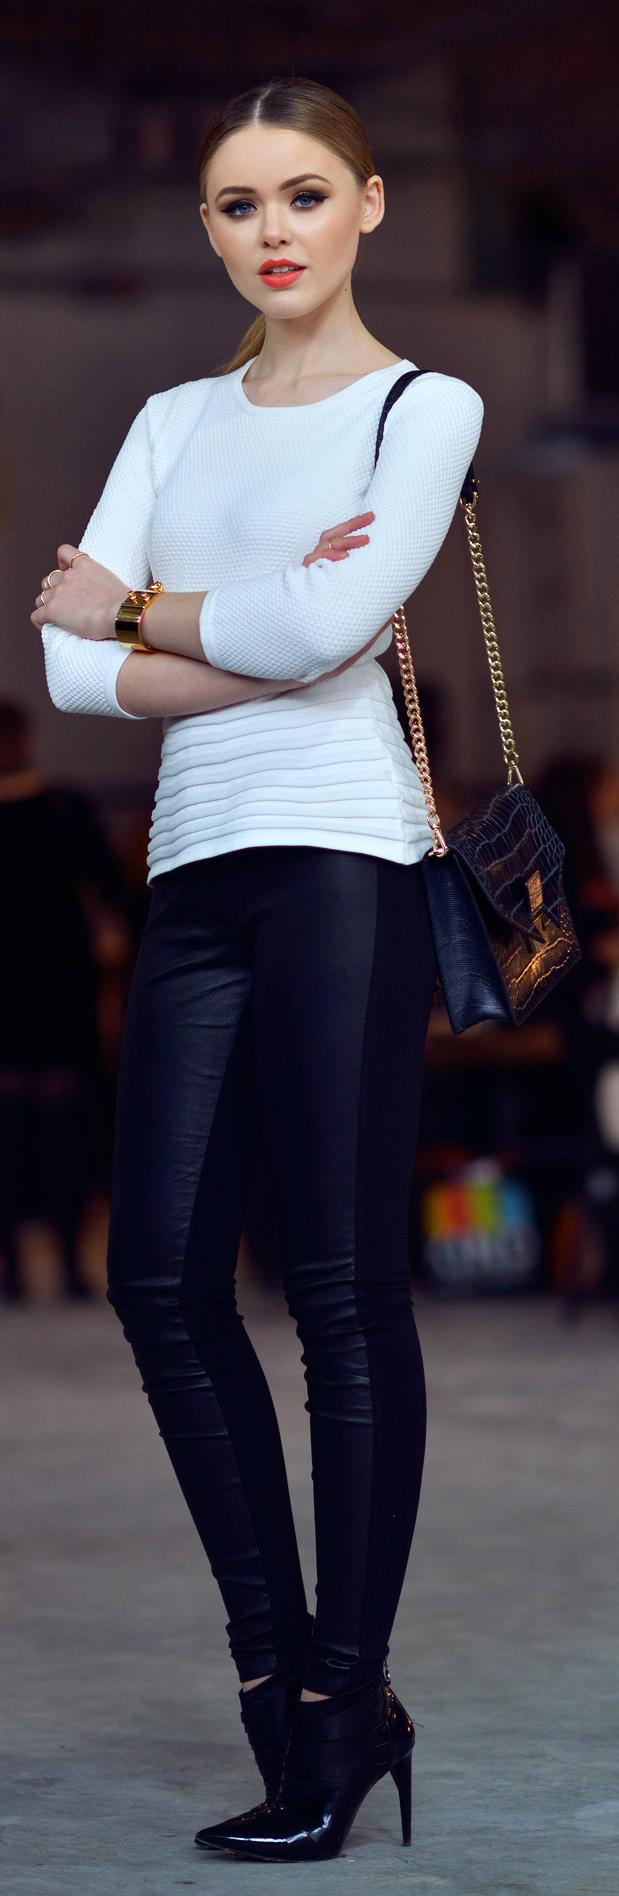 Fashion ● On The Street라이브카지노로얄바카라 ↓BVB7 8 9 。COM* 라이브카지노로얄바카라라이브카지노로얄바카라라이브카지노로얄바카라라이브카지노로얄바카라라이브카지노로얄바카라라이브카지노로얄바카라라이브카지노로얄바카라라이브카지노로얄바카라라이브카지노로얄바카라라이브카지노로얄바카라